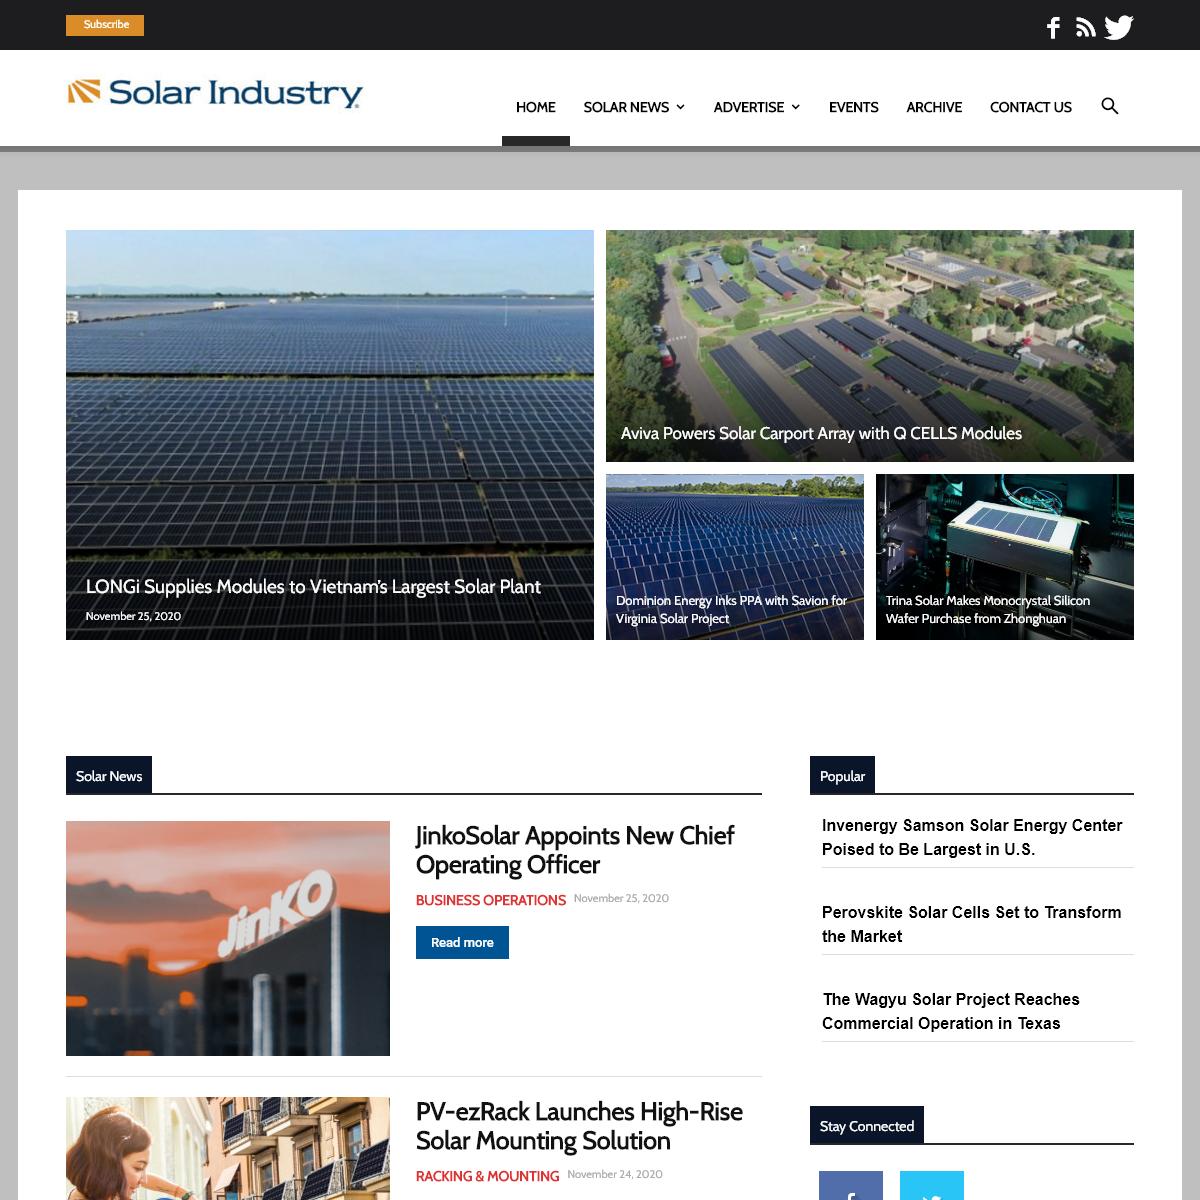 Solar Power News - Solar Industry